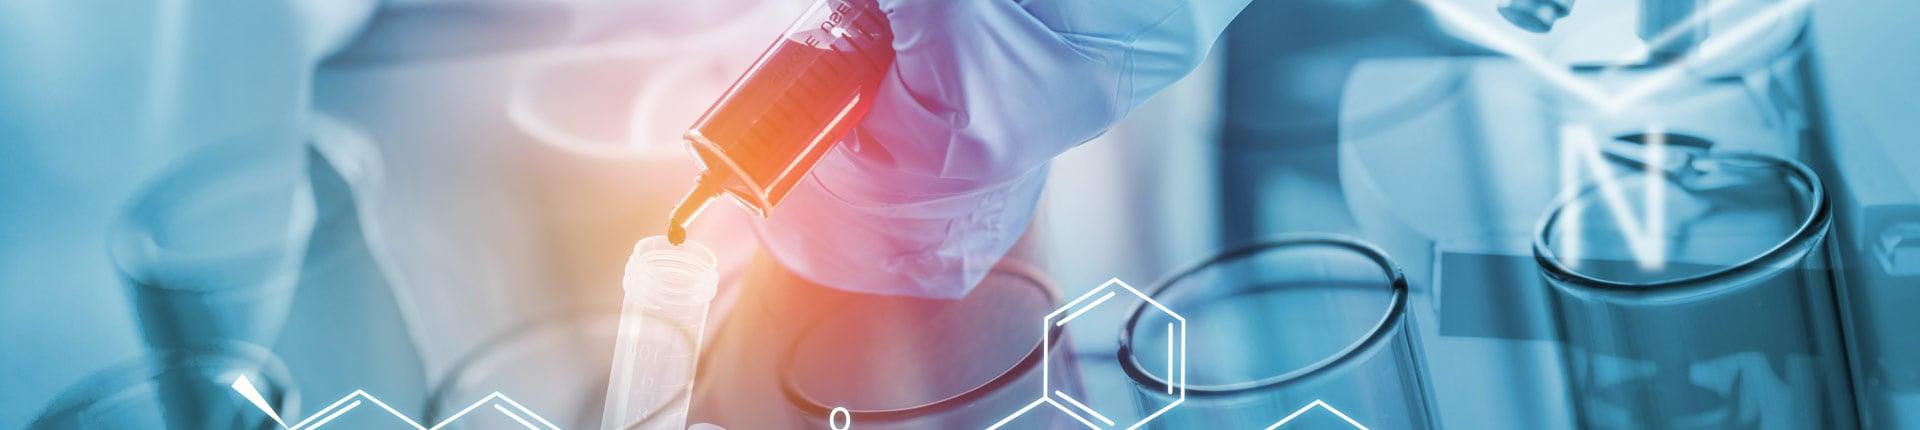 Naltrexone - cudowny lek? Opinie